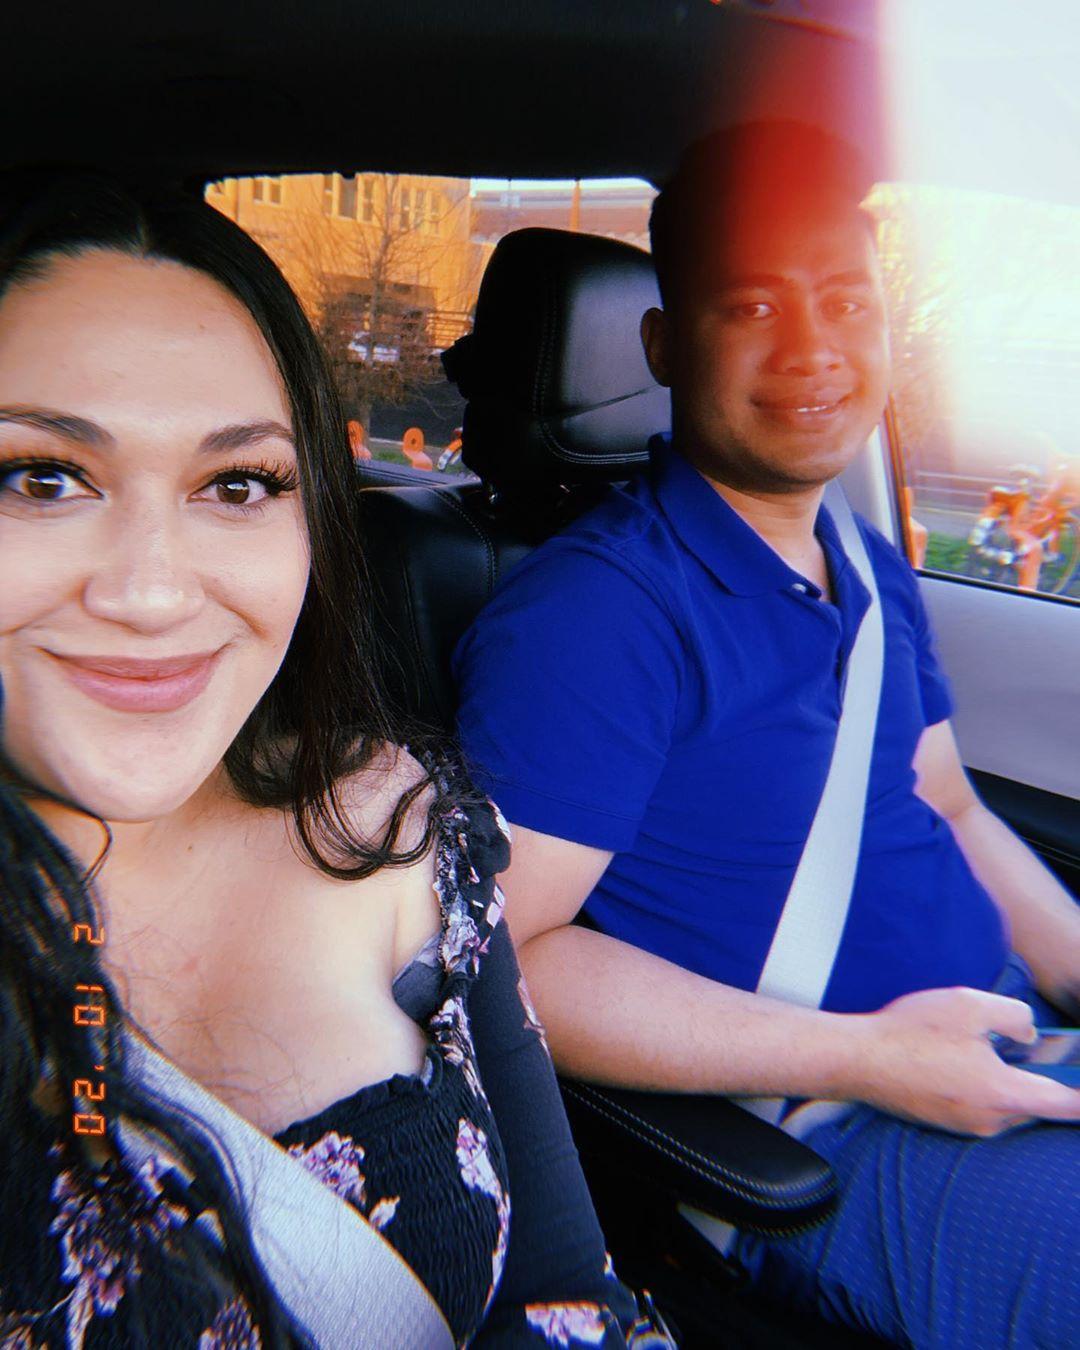 90 day fiance kalani asuelu relationship timeline